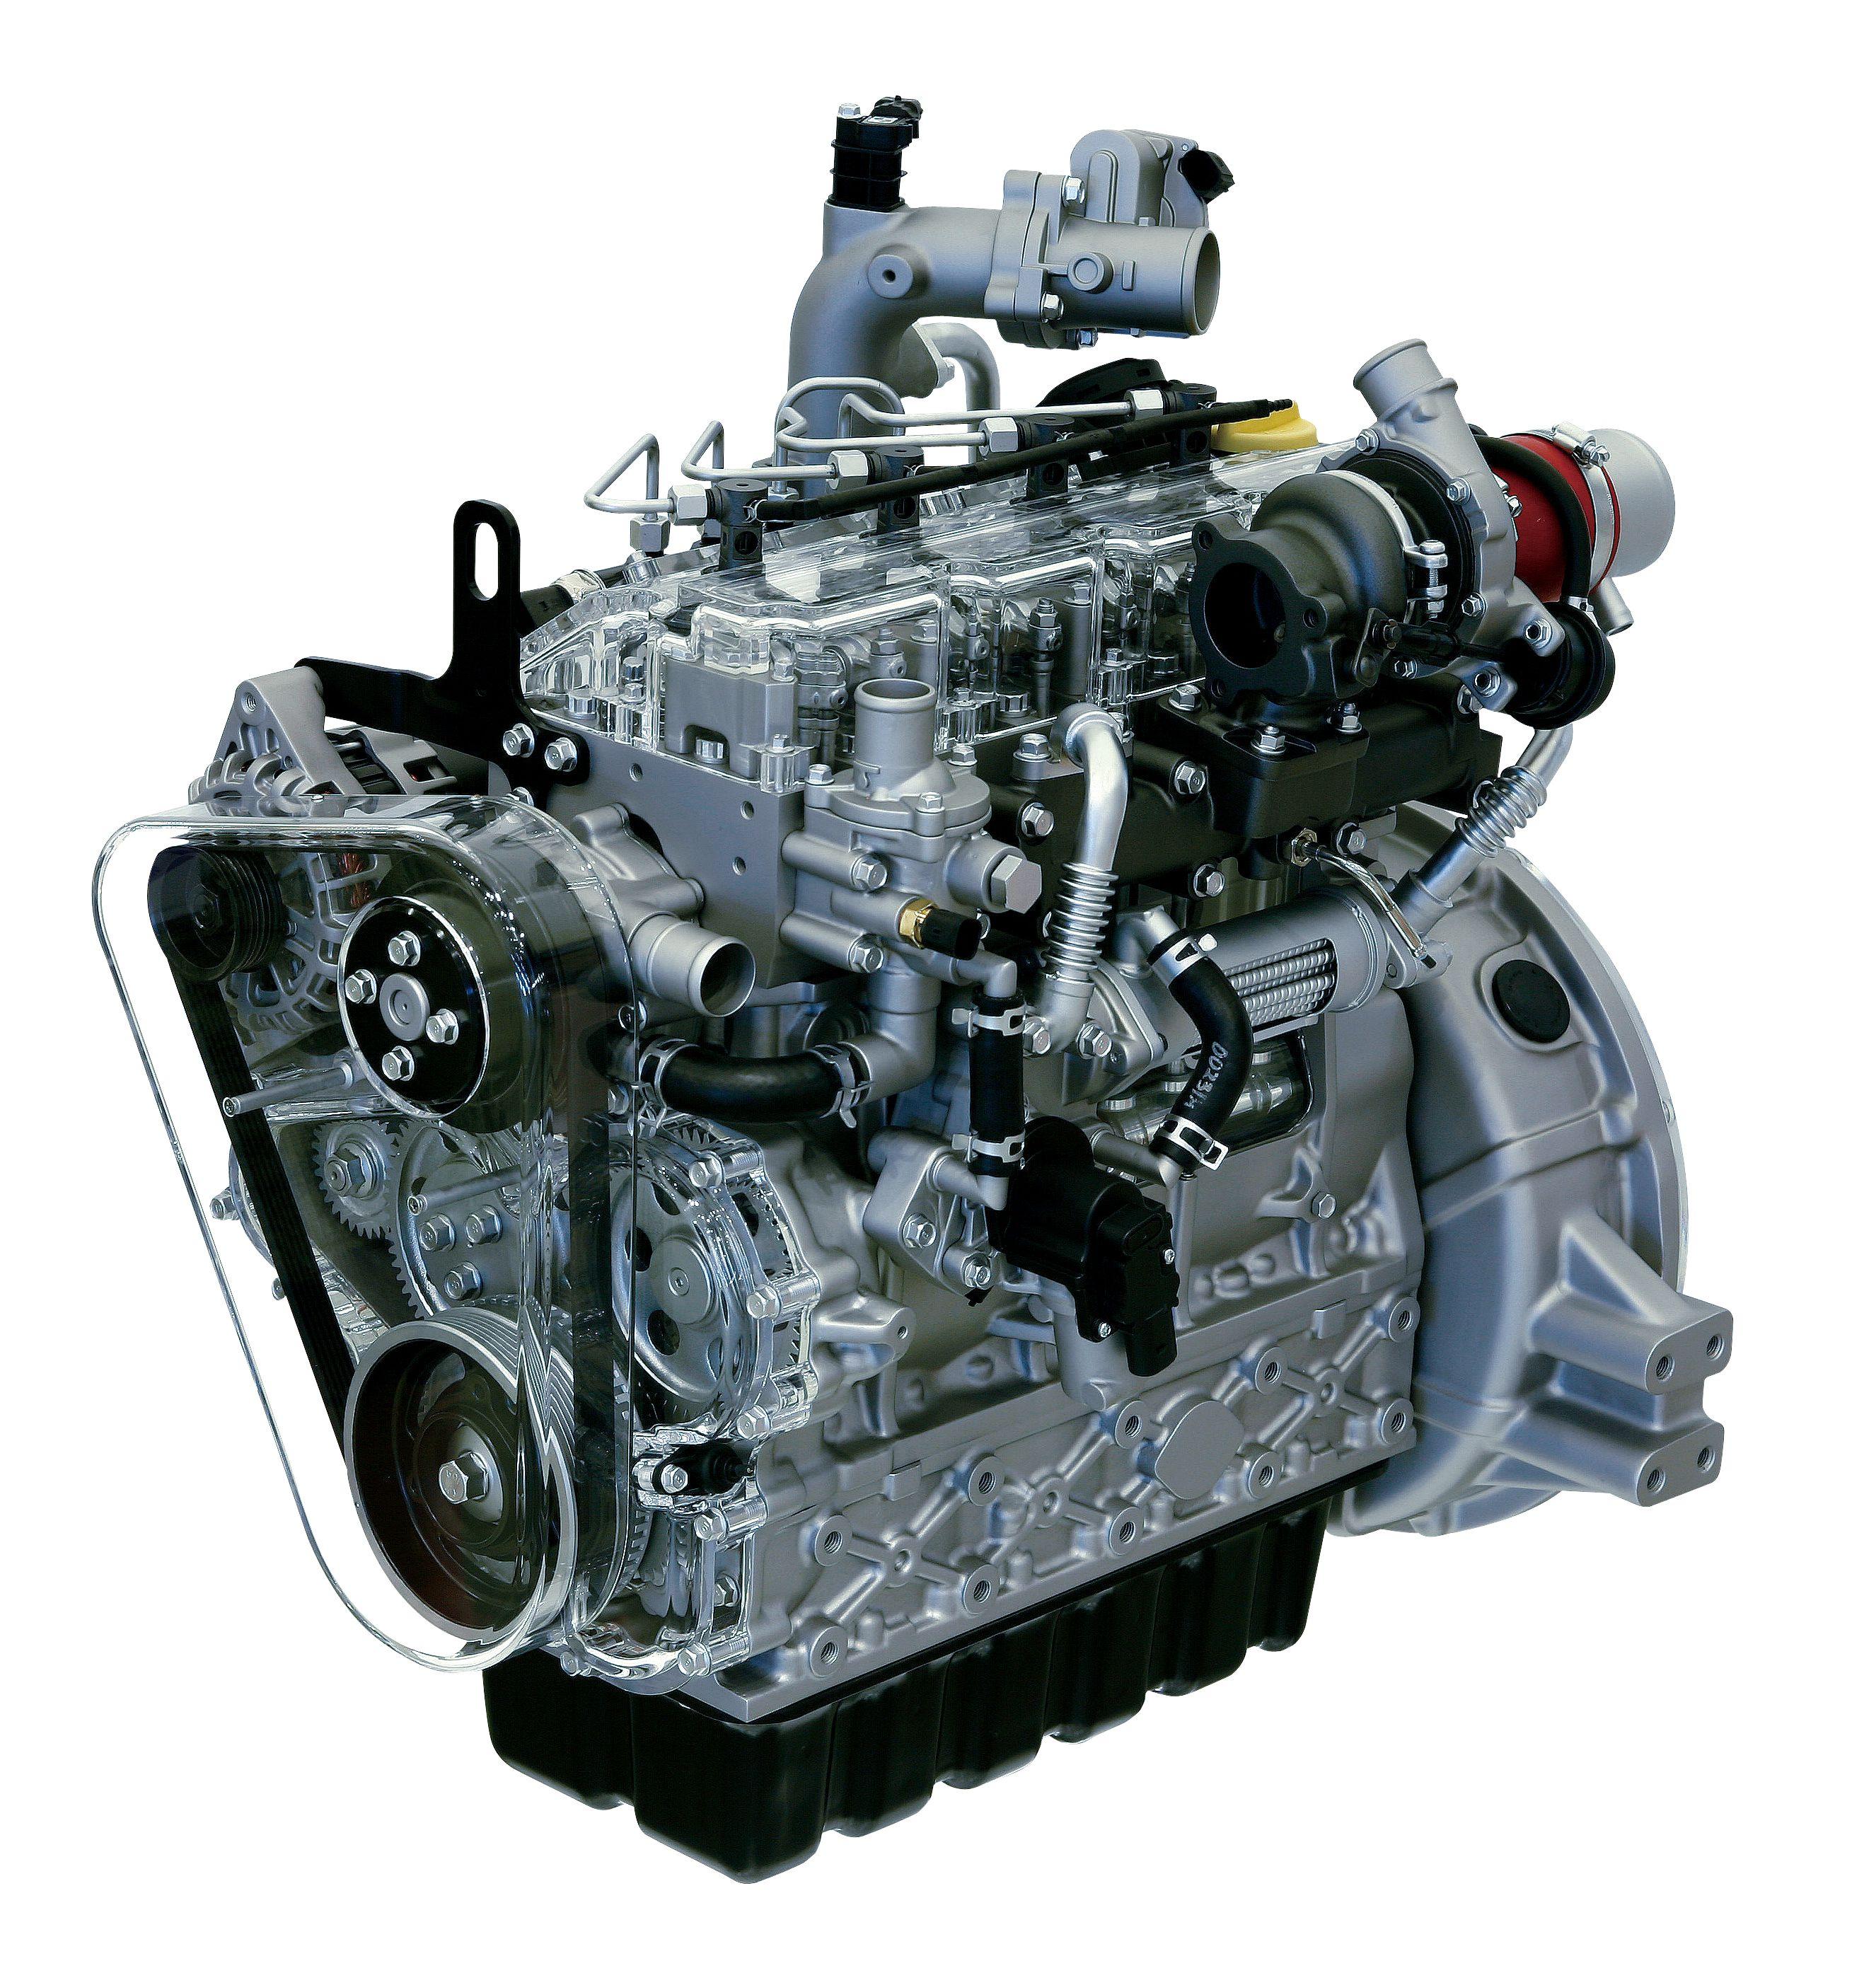 Doosan G2 Engine Wins Flta Innovation Award Doosan Forklifts